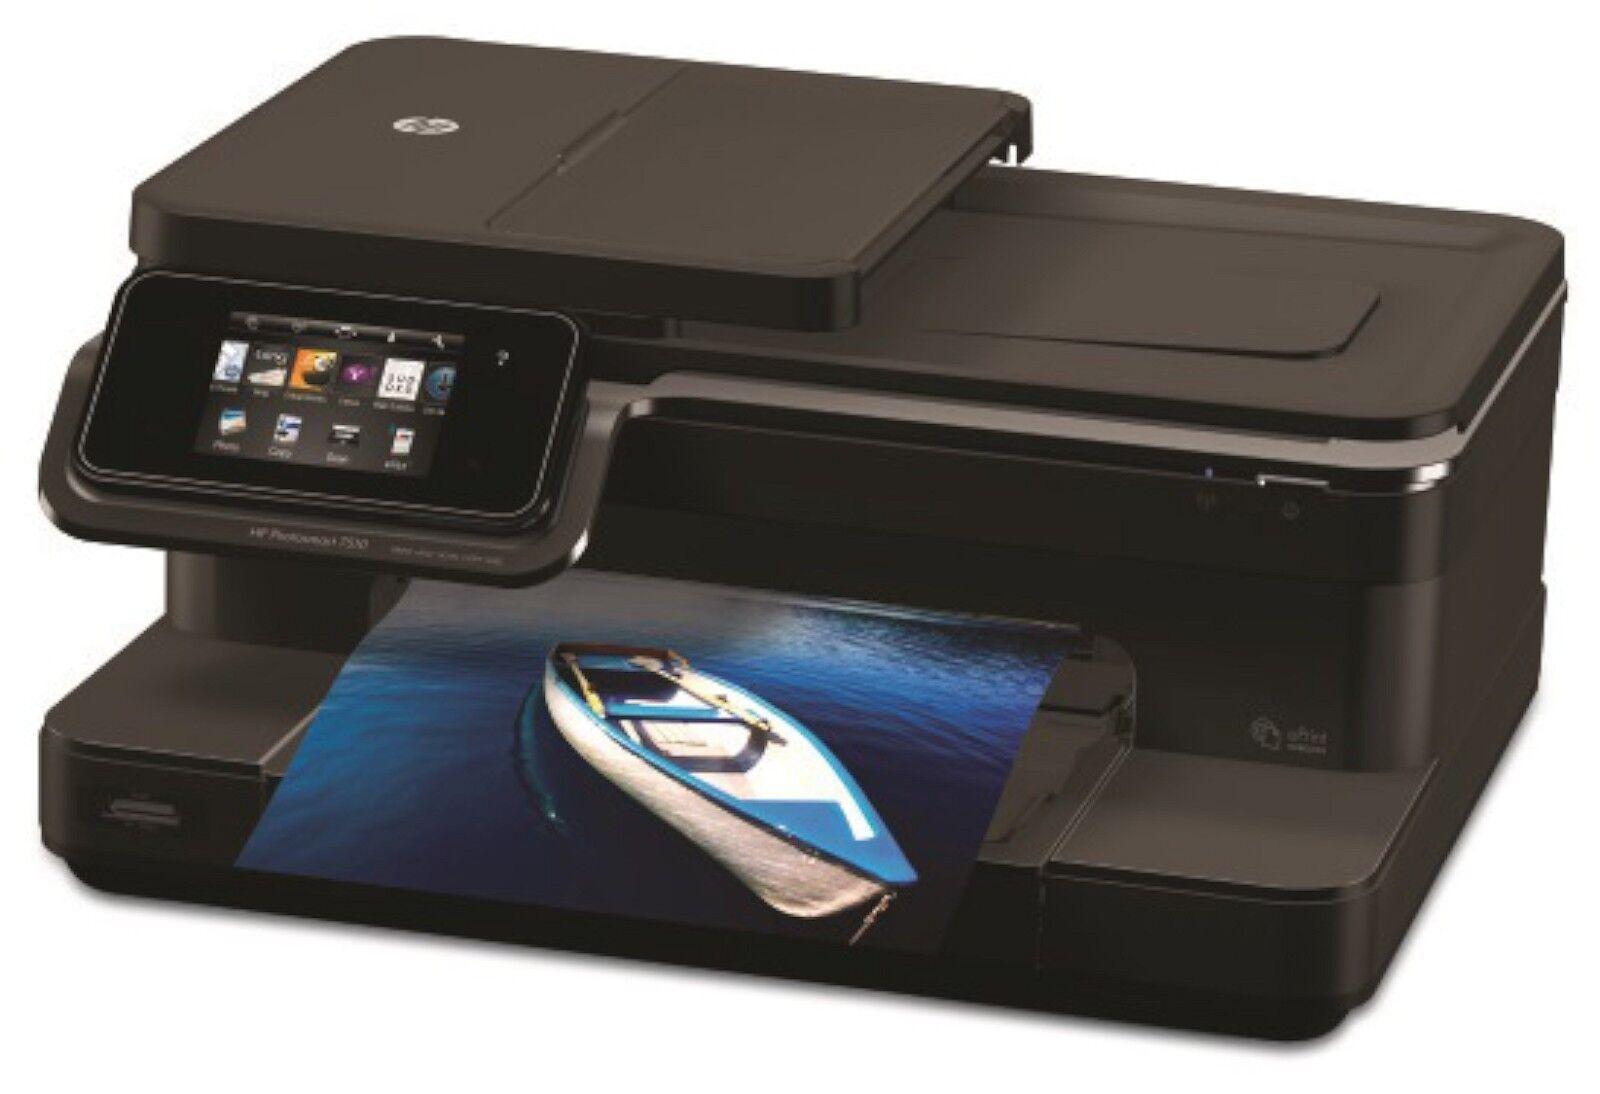 Hp Photosmart Print Scan Copy 7510 All In One Desktop